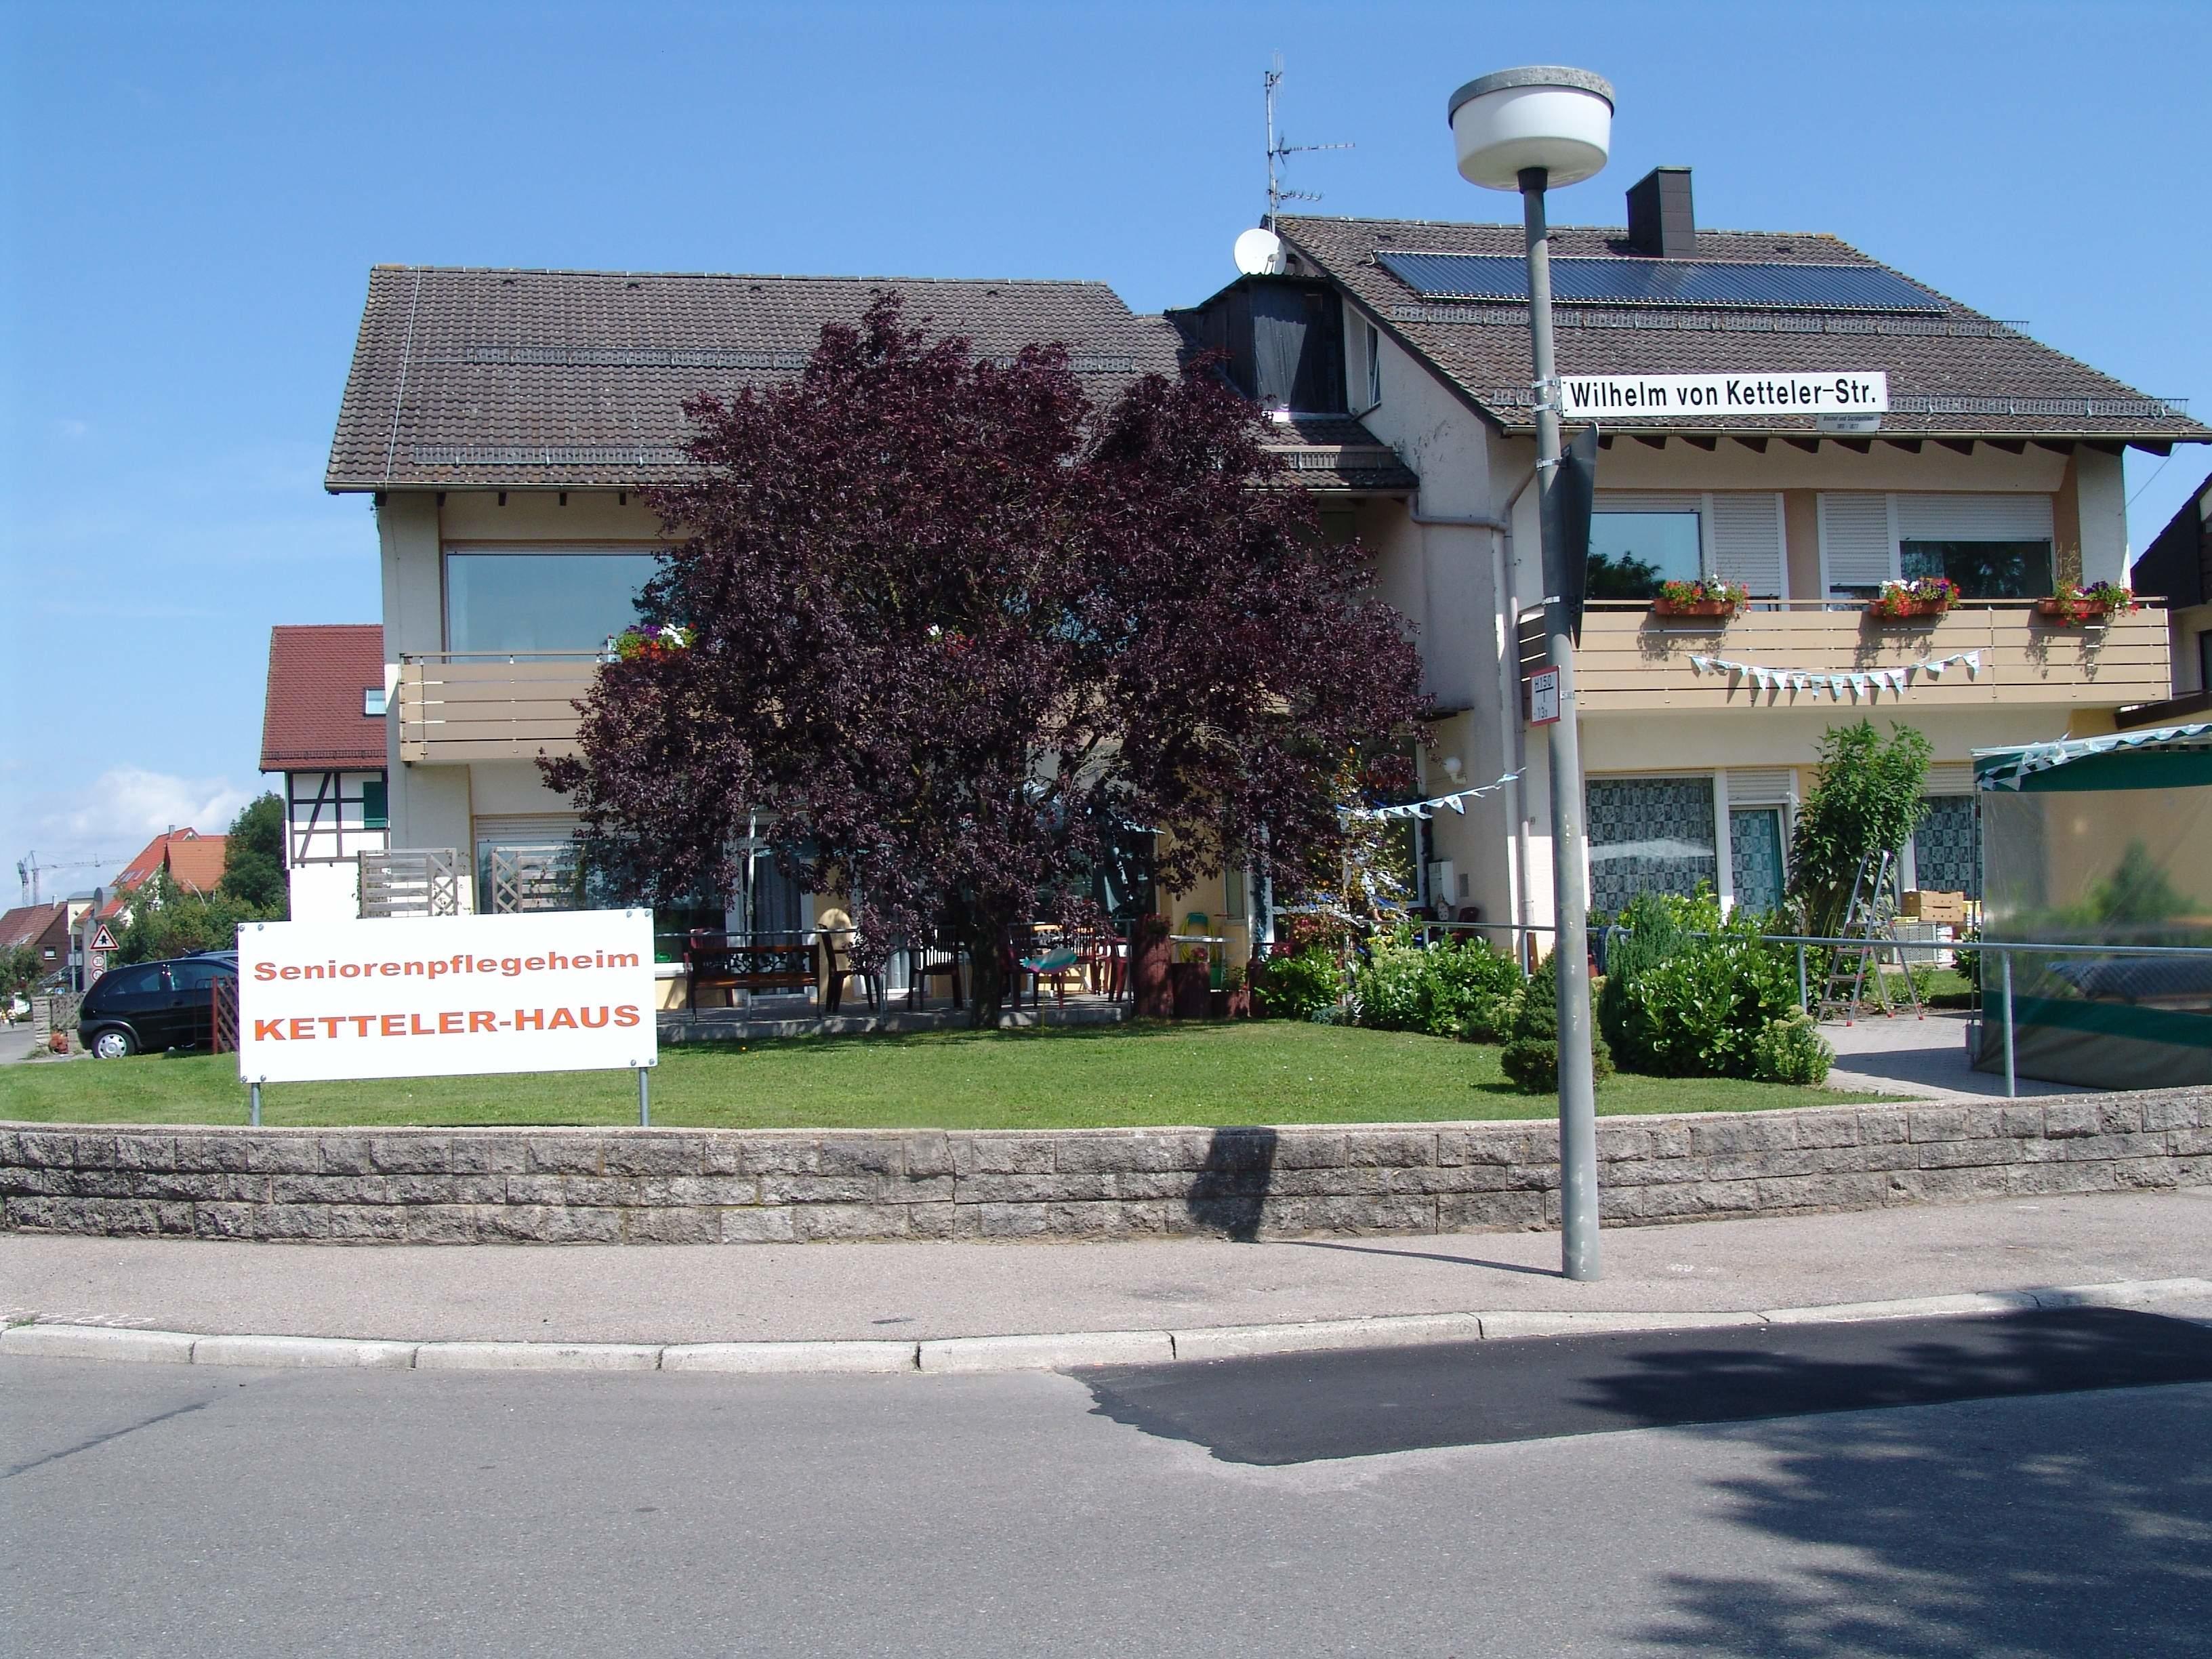 Seniorenpflegeheim Ketteler Haus